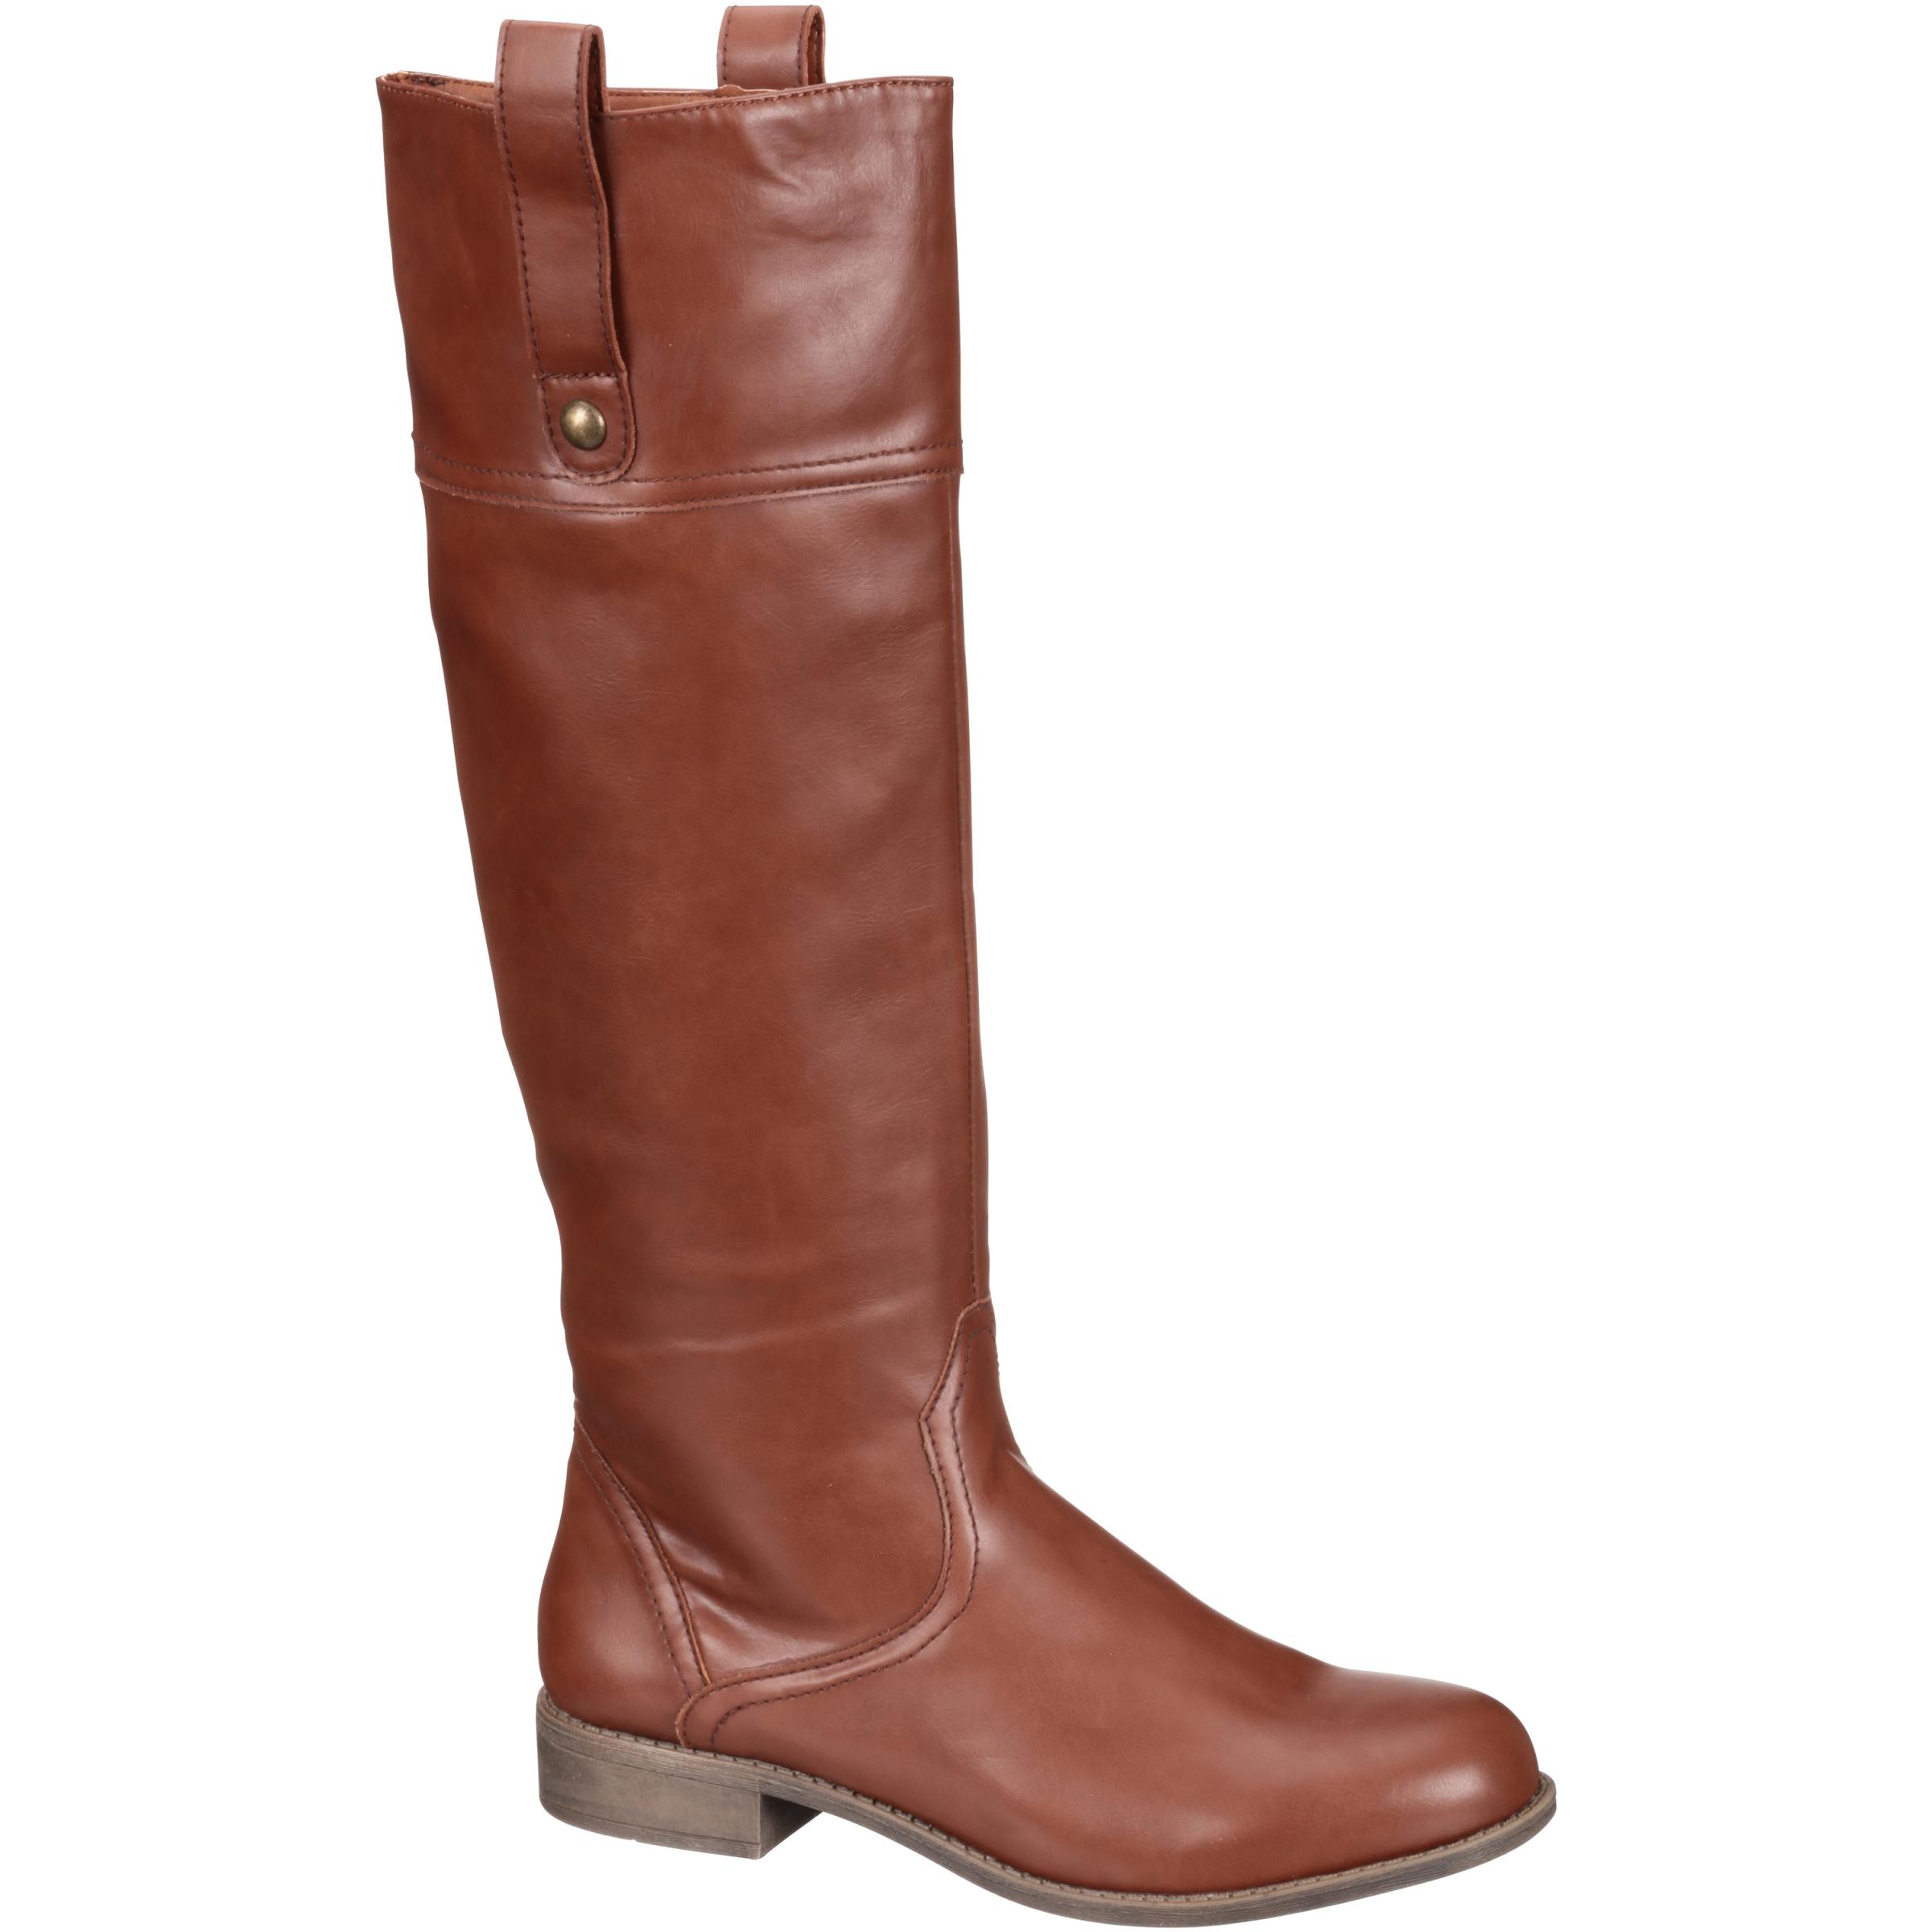 MoMo Women's Alani Boot Shoe Size: 11